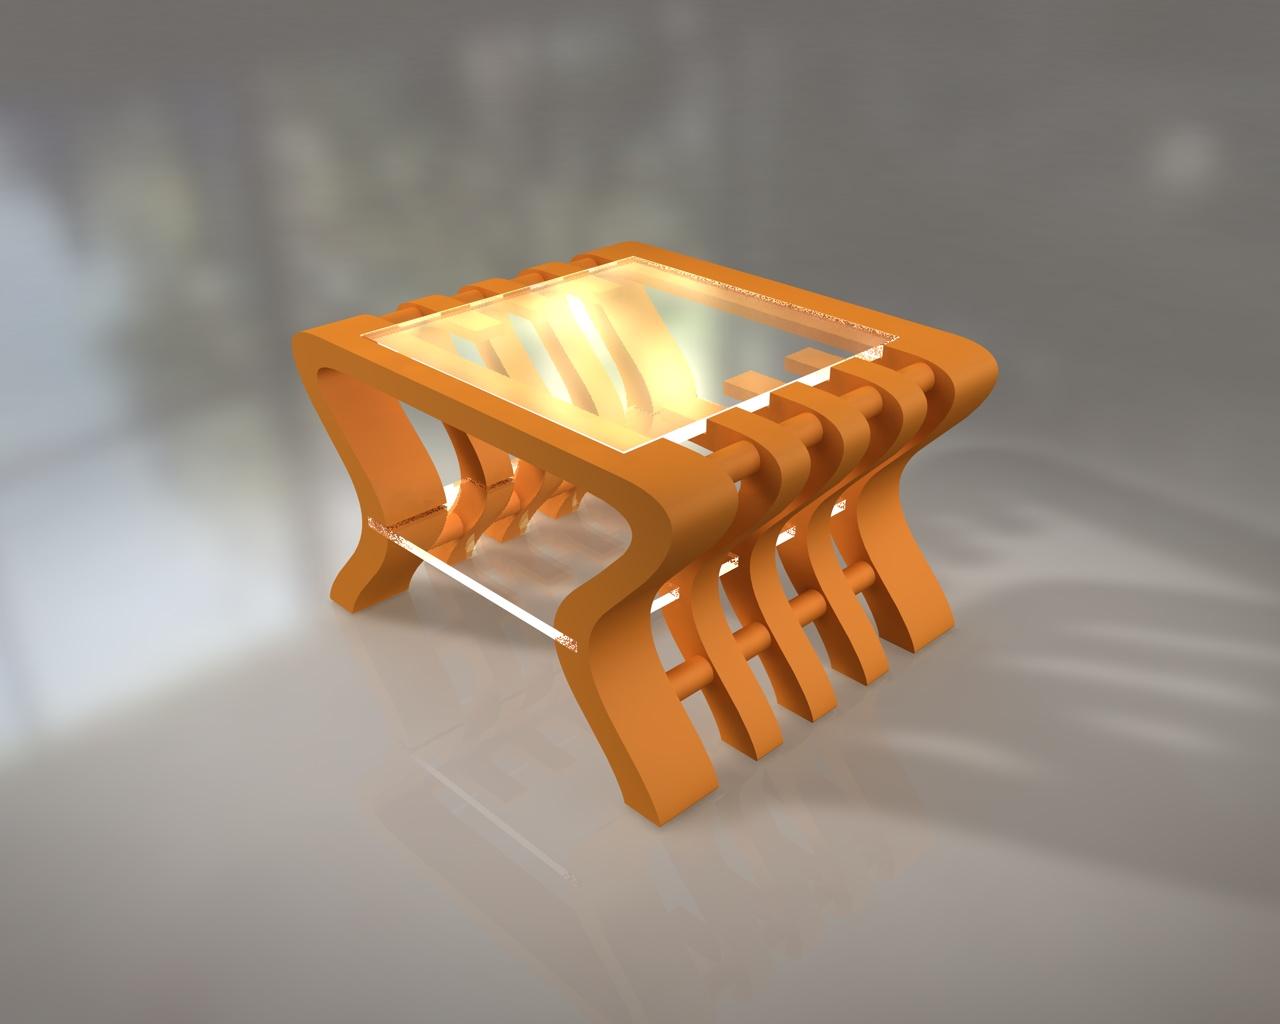 Vincent gianfranceschi table basse carton plexi glace - Table basse en carton ...